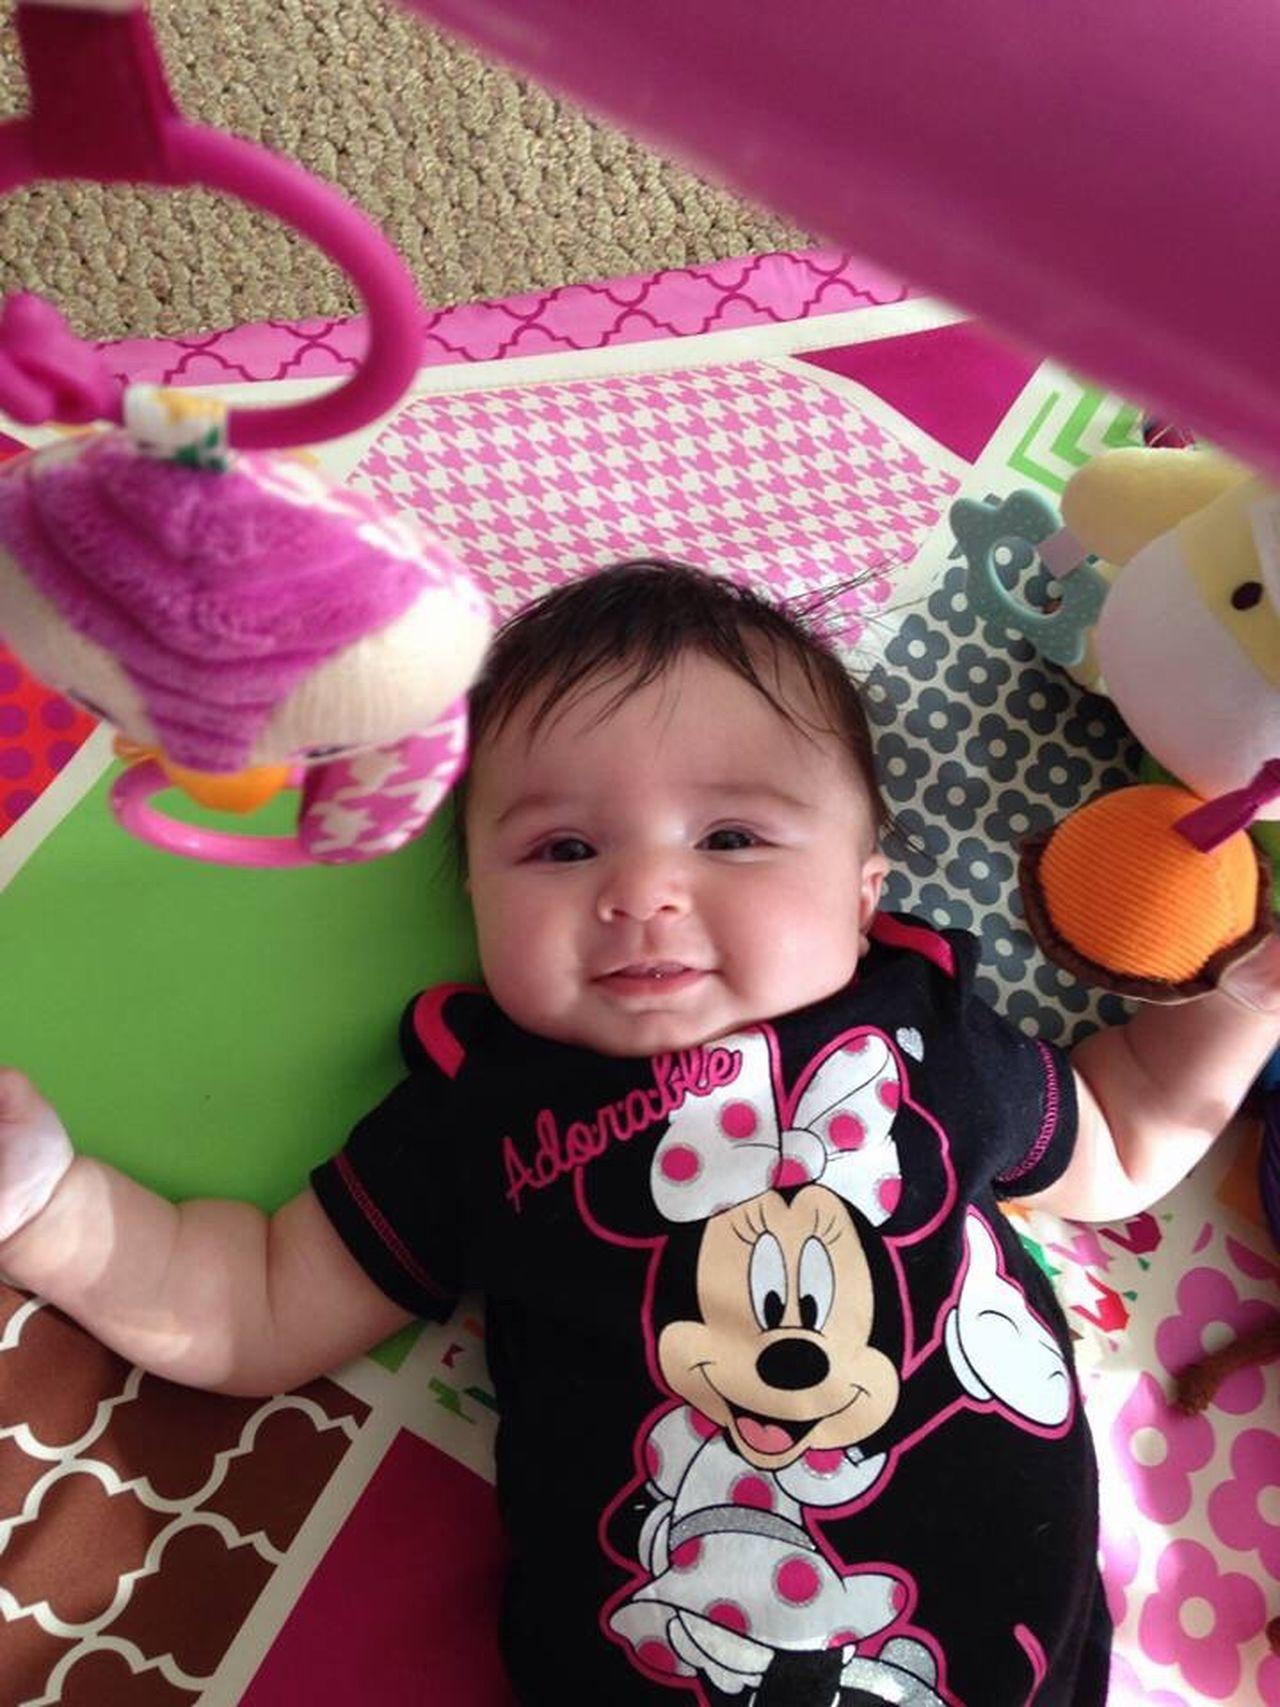 Niece 💕 Angelina Baby BabySmiles Babygirl Adorable Socute💕 ILoveMyNiece Hello World Cheese! Check This Out LongIslandNY